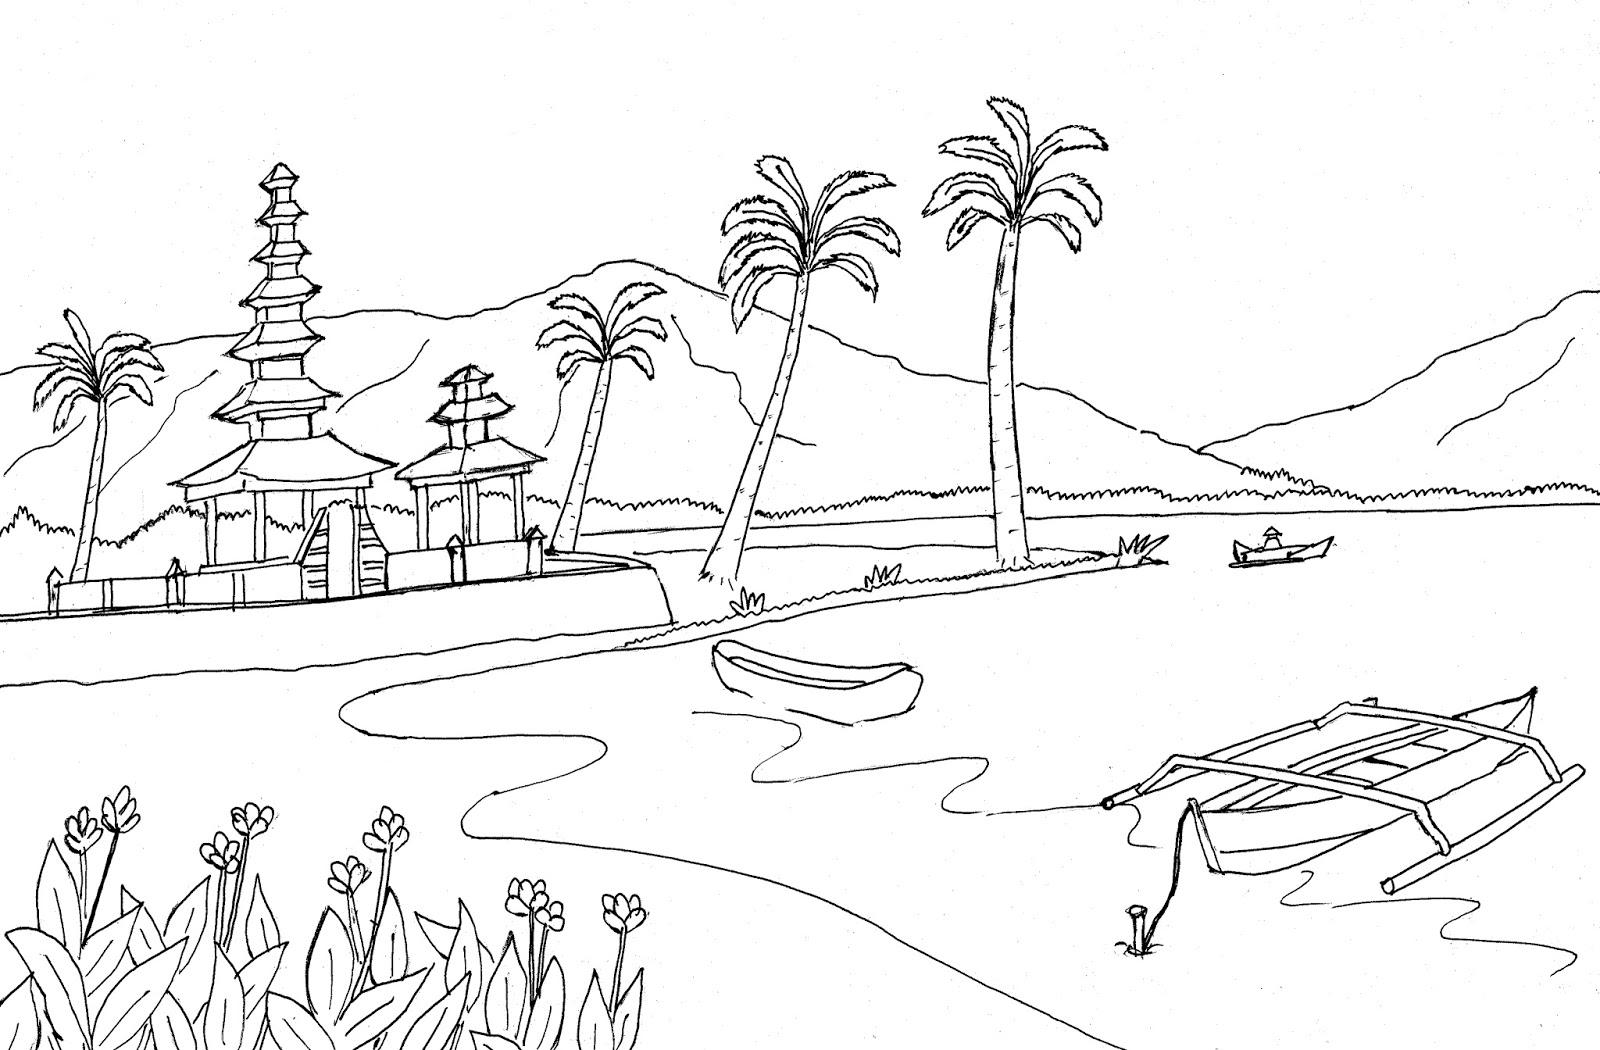 Gambar mewarnai pemandangan pantai Bali pura dan perahu Colouring Bali Beach